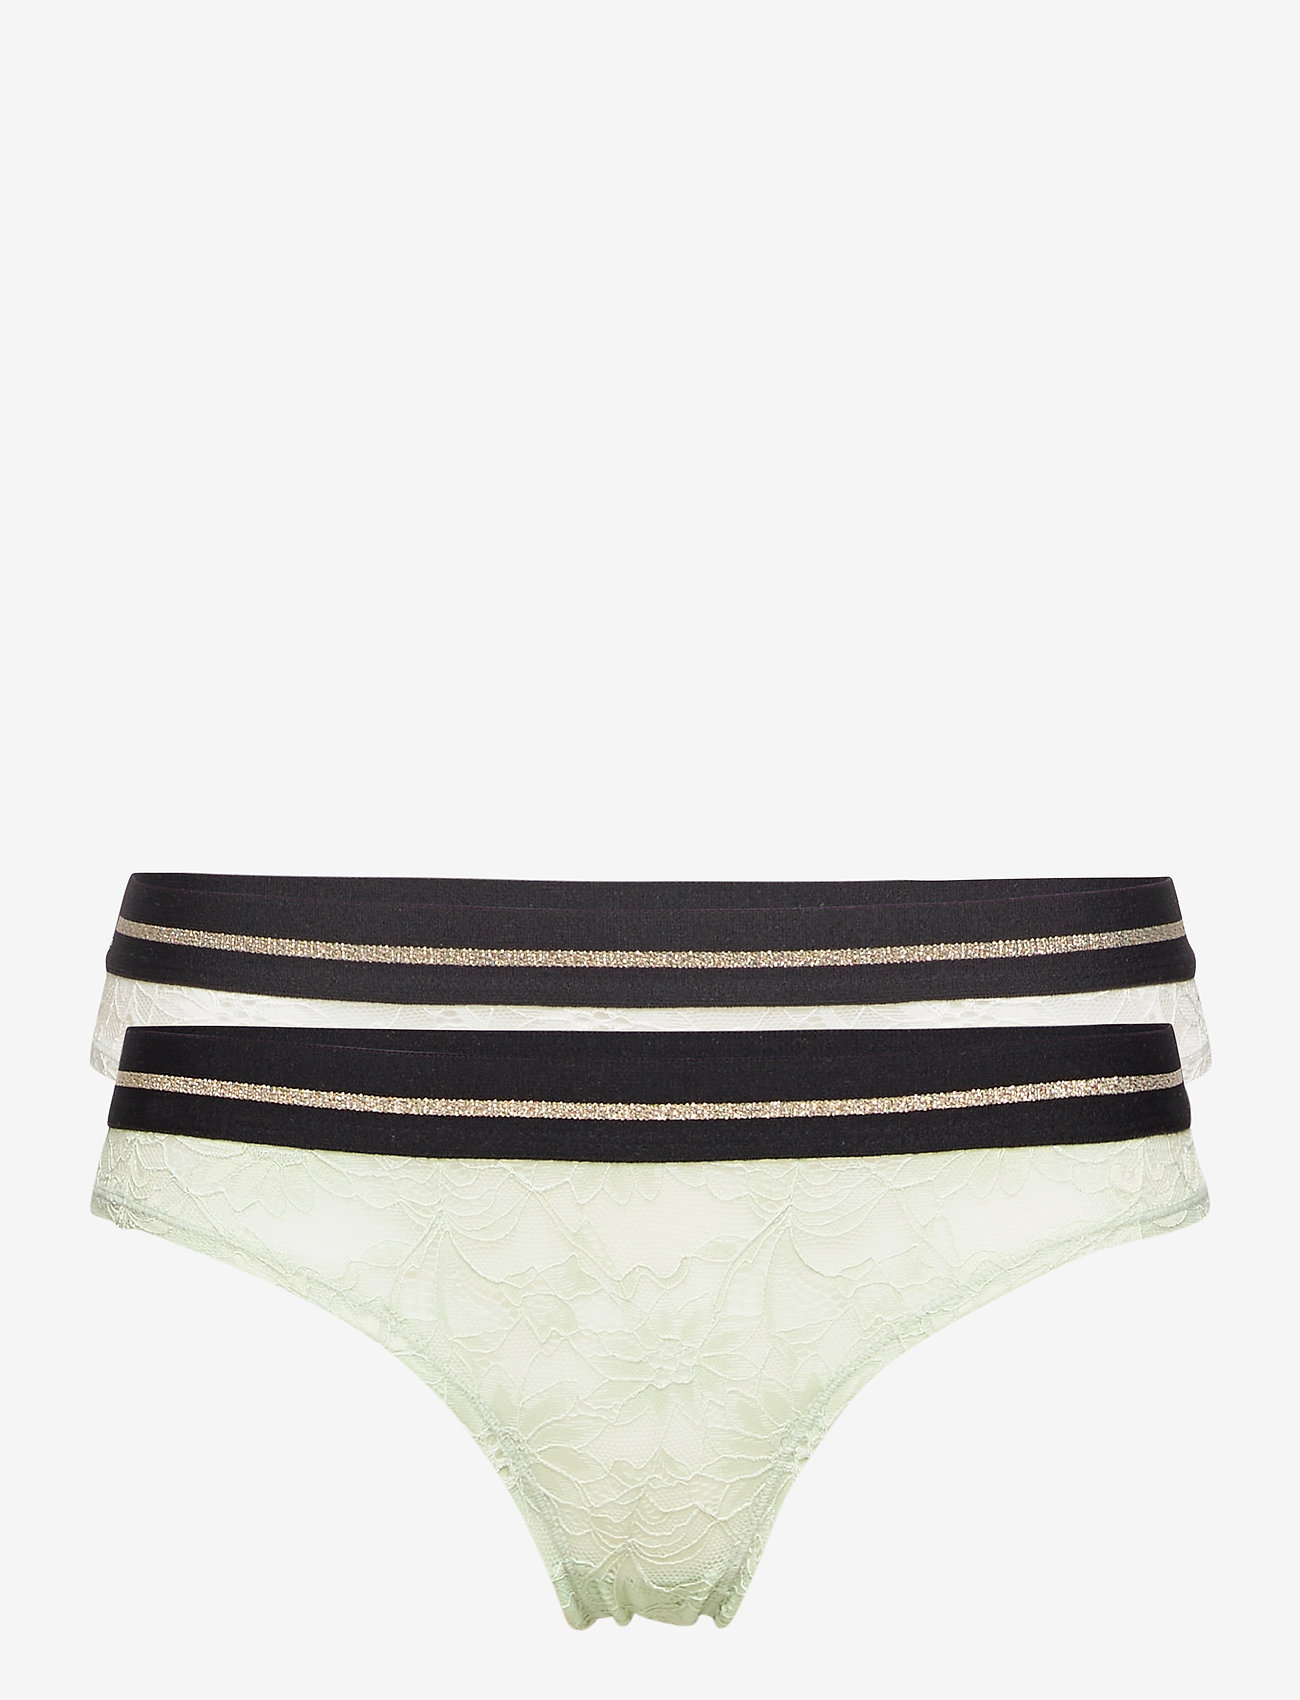 Danish Endurance - Blooming Lace Bikini Briefs by Pernille Blume 2 Pack - slips - multicolor (1 x white, 1 x sea foam green) - 0